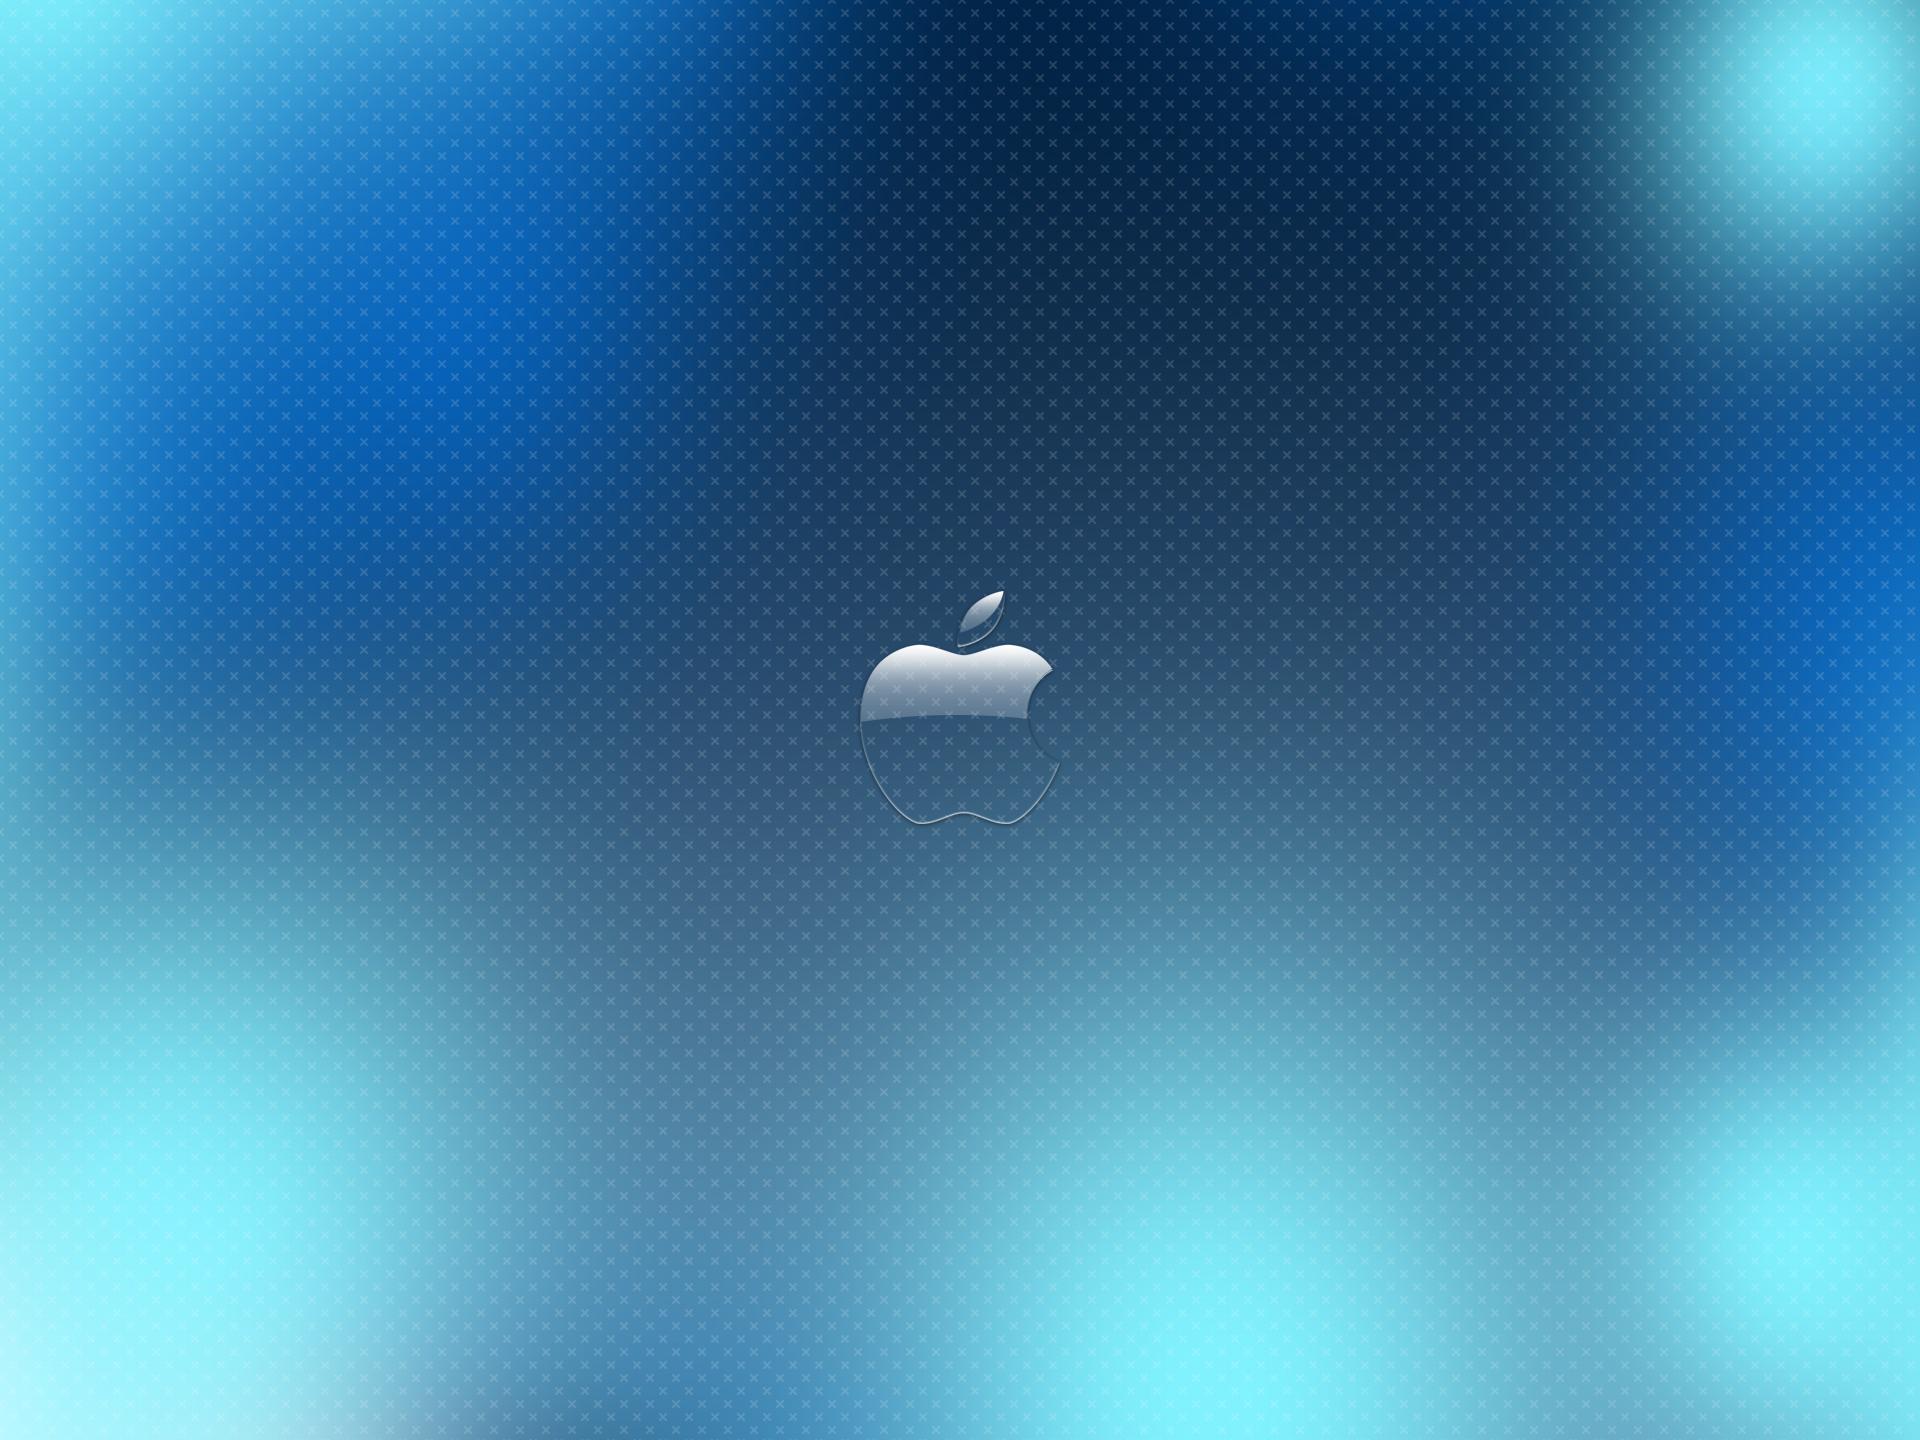 HD Wallpapers Blue Glass Apple